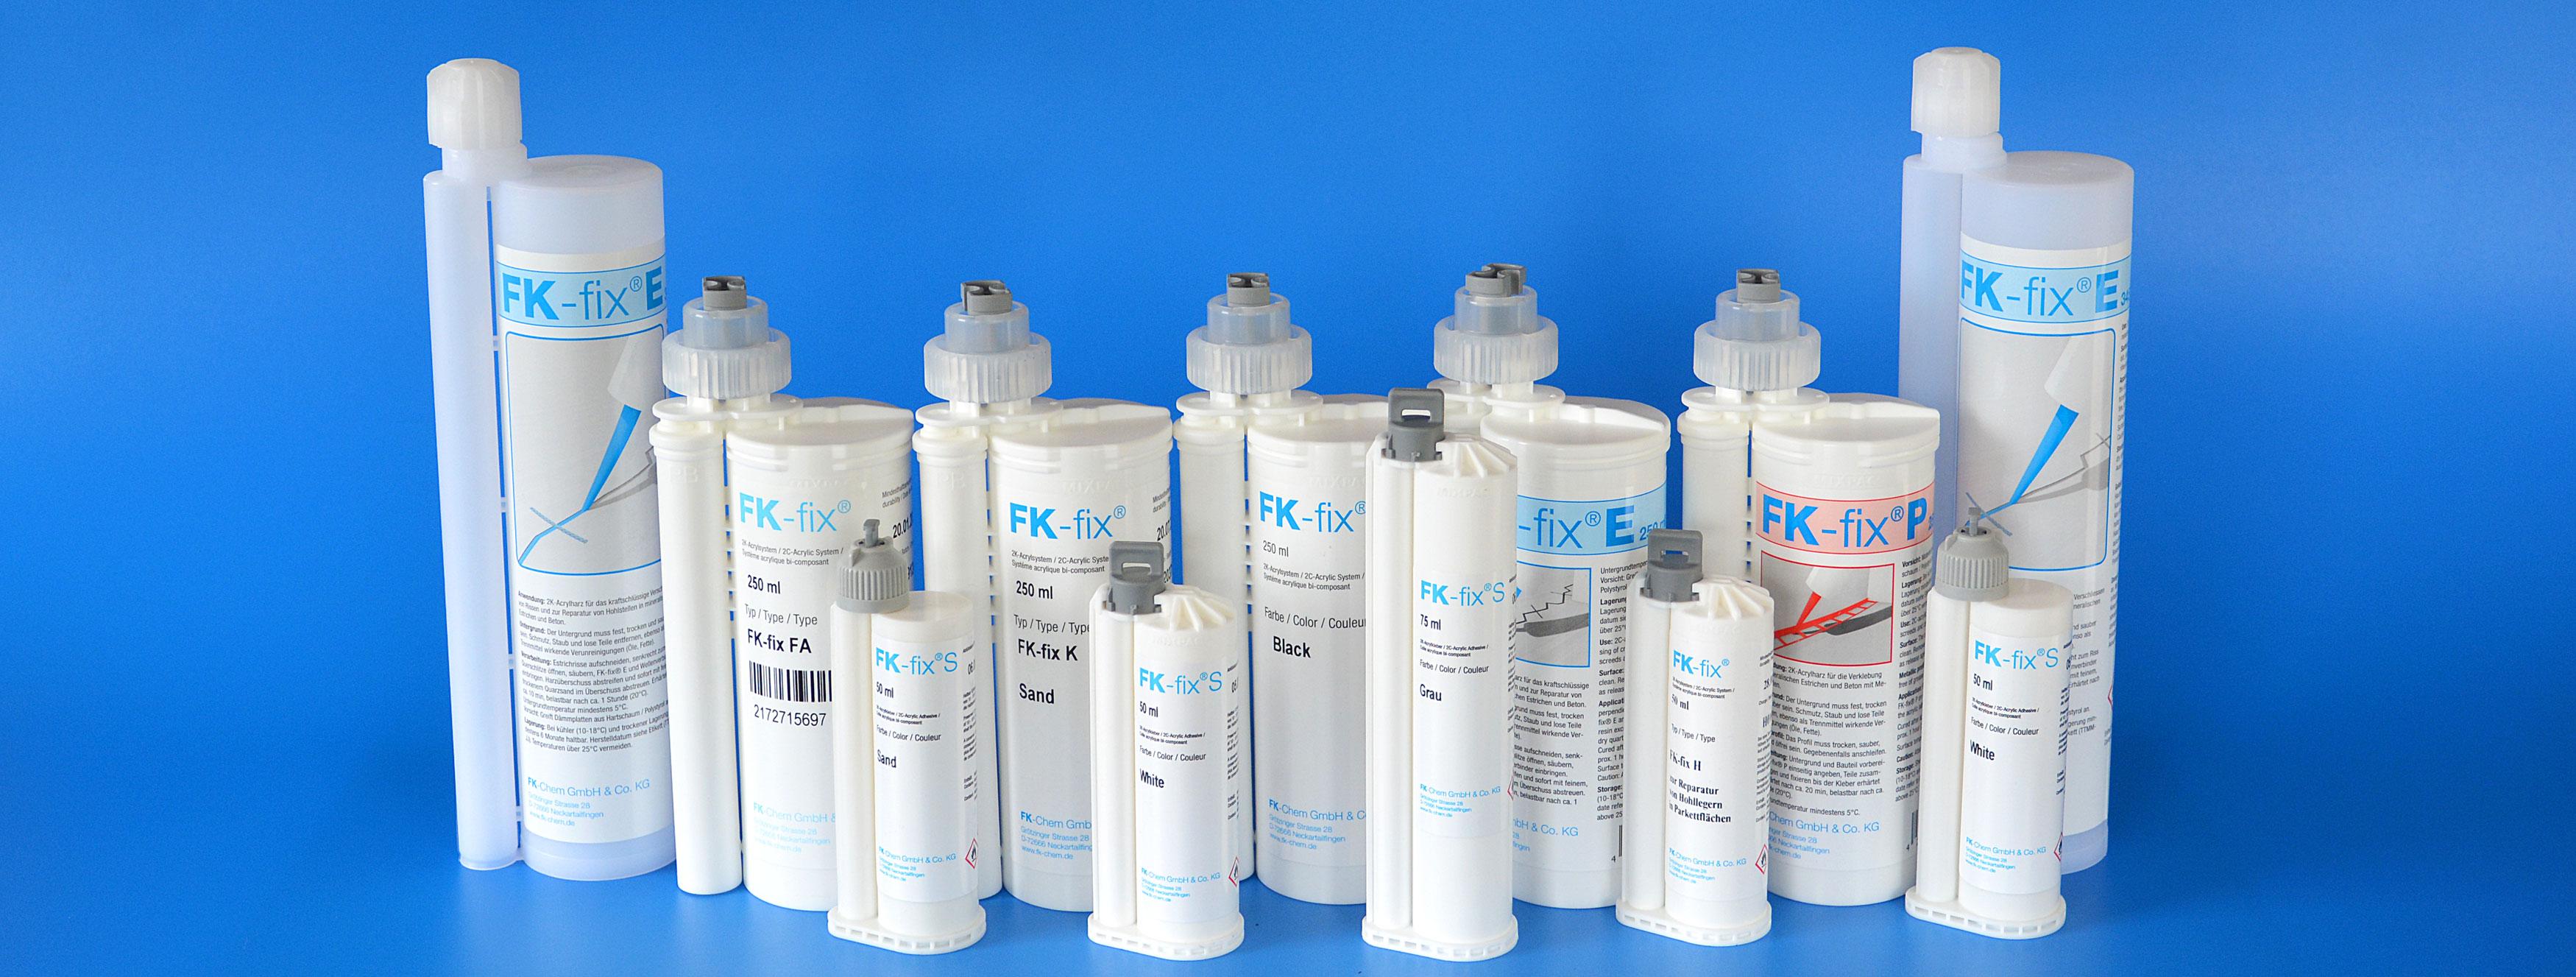 FK-Produktpalette_blau_8